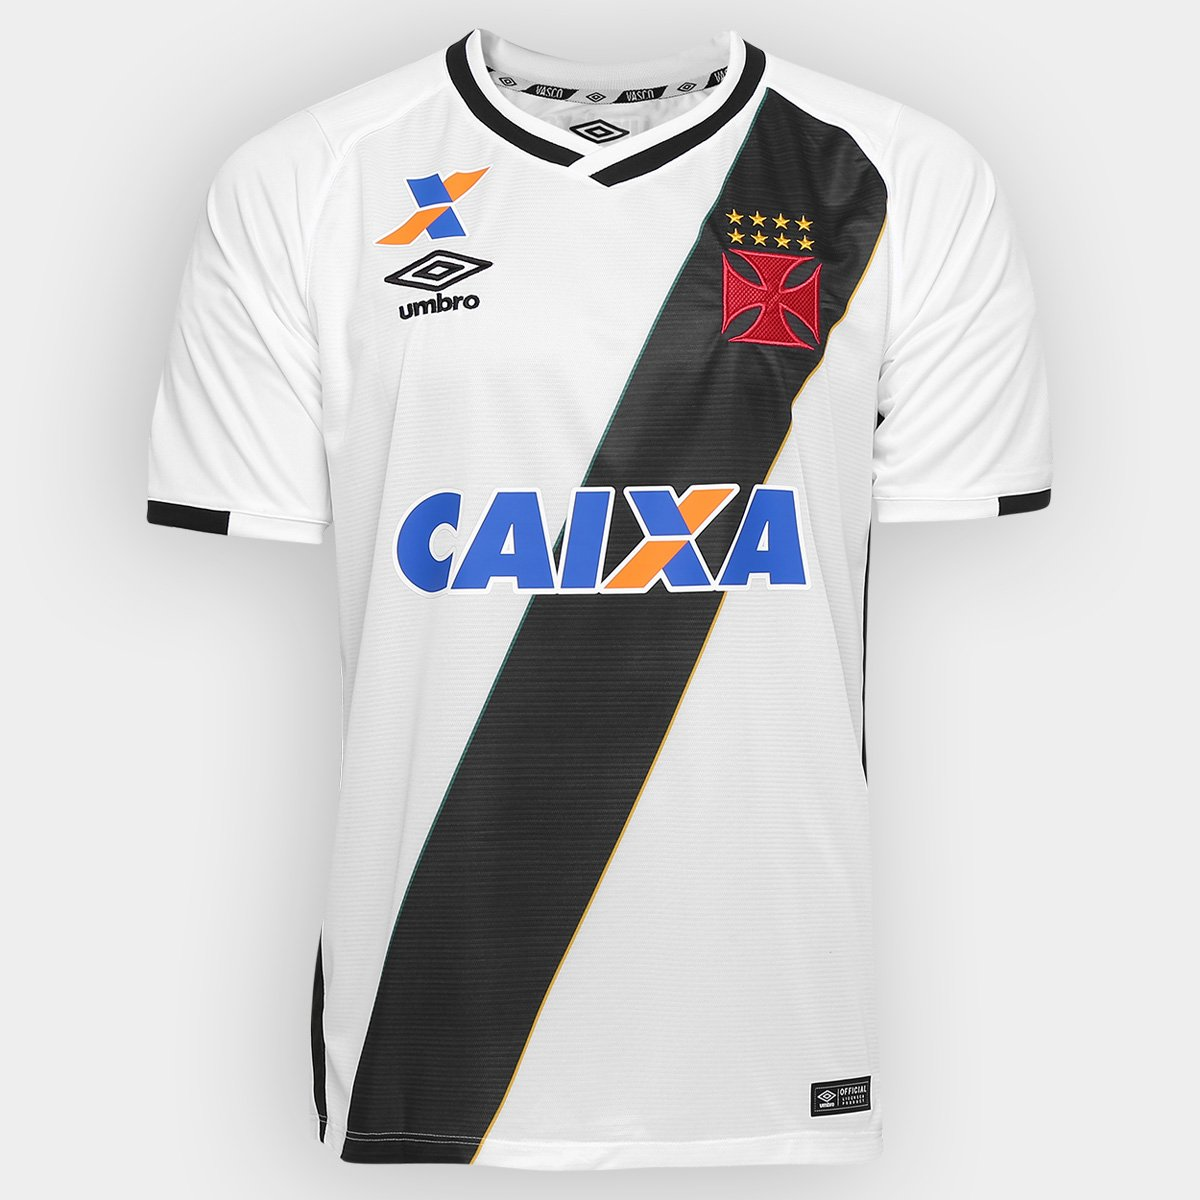 90616171a7 Camisa Vasco II 2016 nº 10 - Torcedor Umbro Masculina - Compre Agora ...